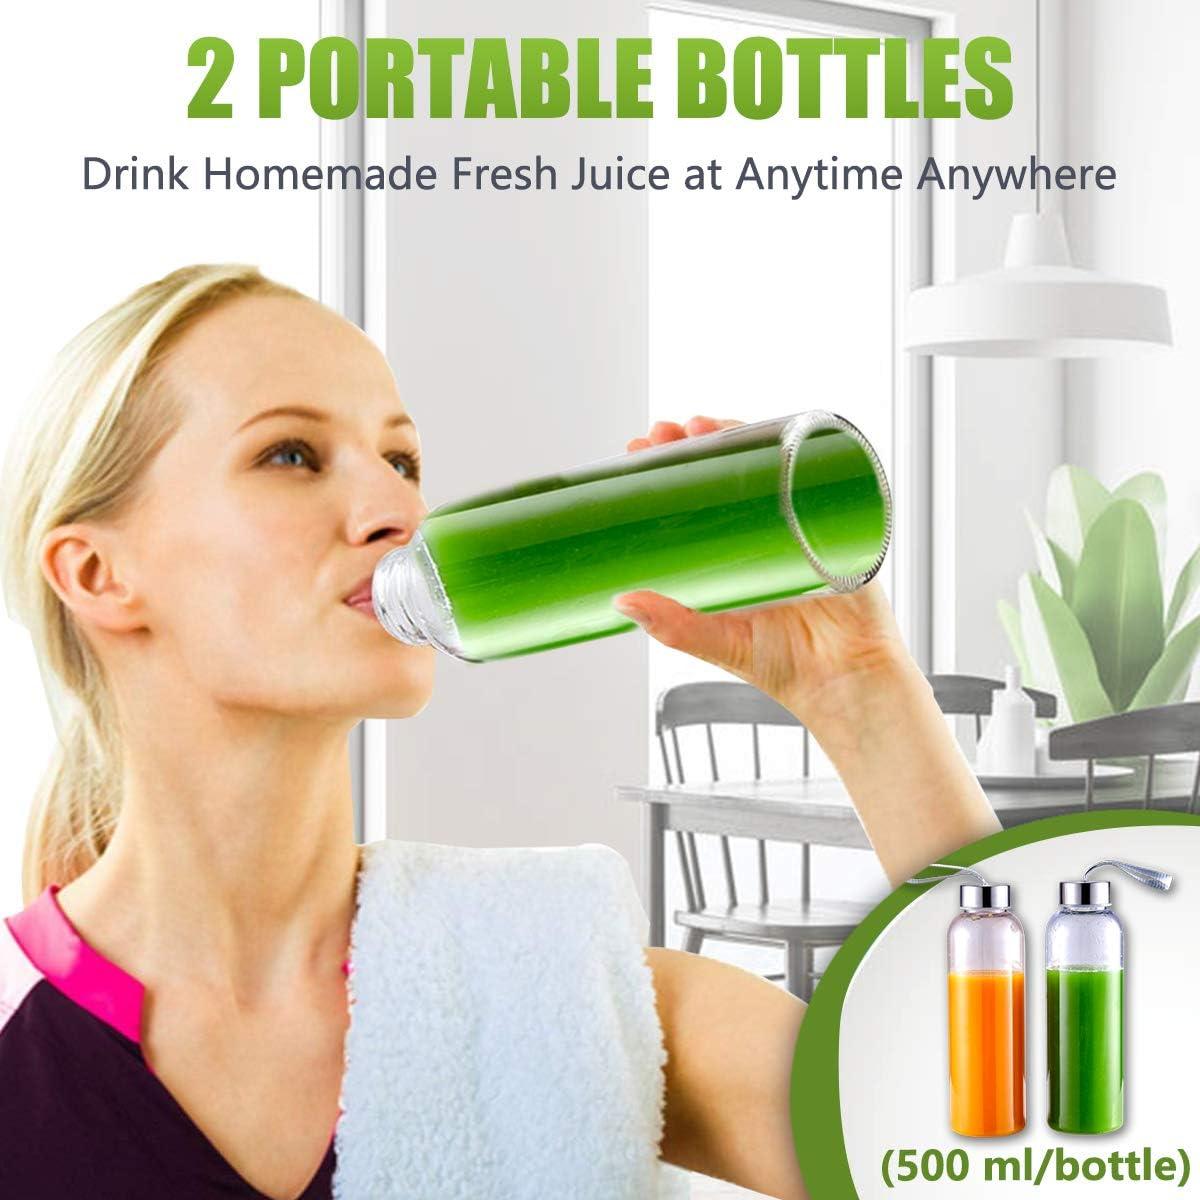 500ML cepillo f/ácil de limpiar,Blanco Extractor de zumos con 2 velocidades panel de pantalla LED Licuadora prensada en fr/ío AMZCHEF licuadora de frutas y verduras 2 botellas de agua